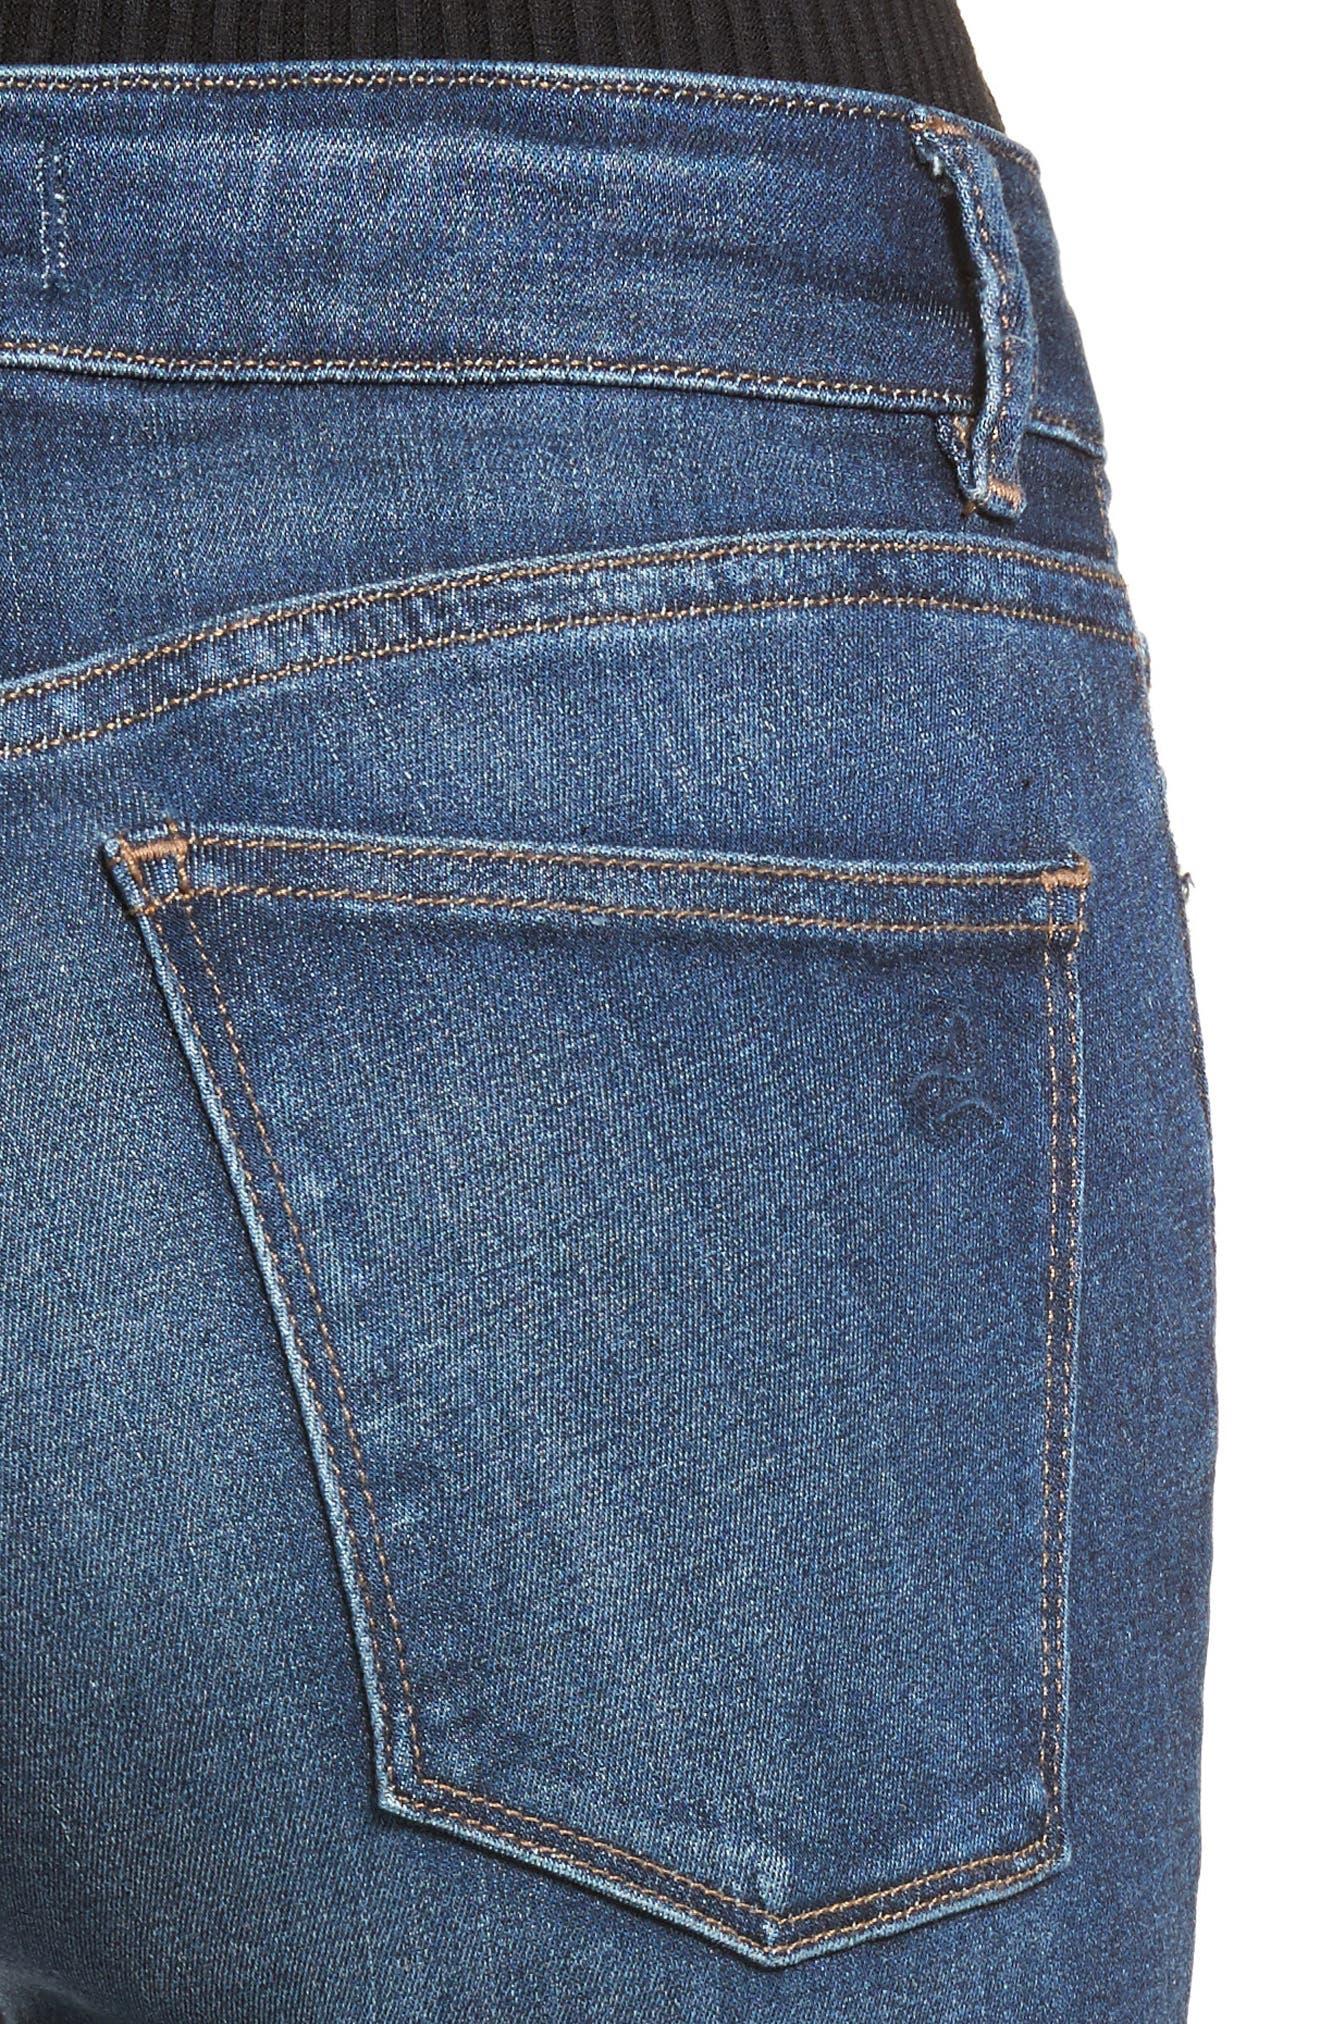 Florence Instasculpt Crop Skinny Jeans,                             Alternate thumbnail 4, color,                             405